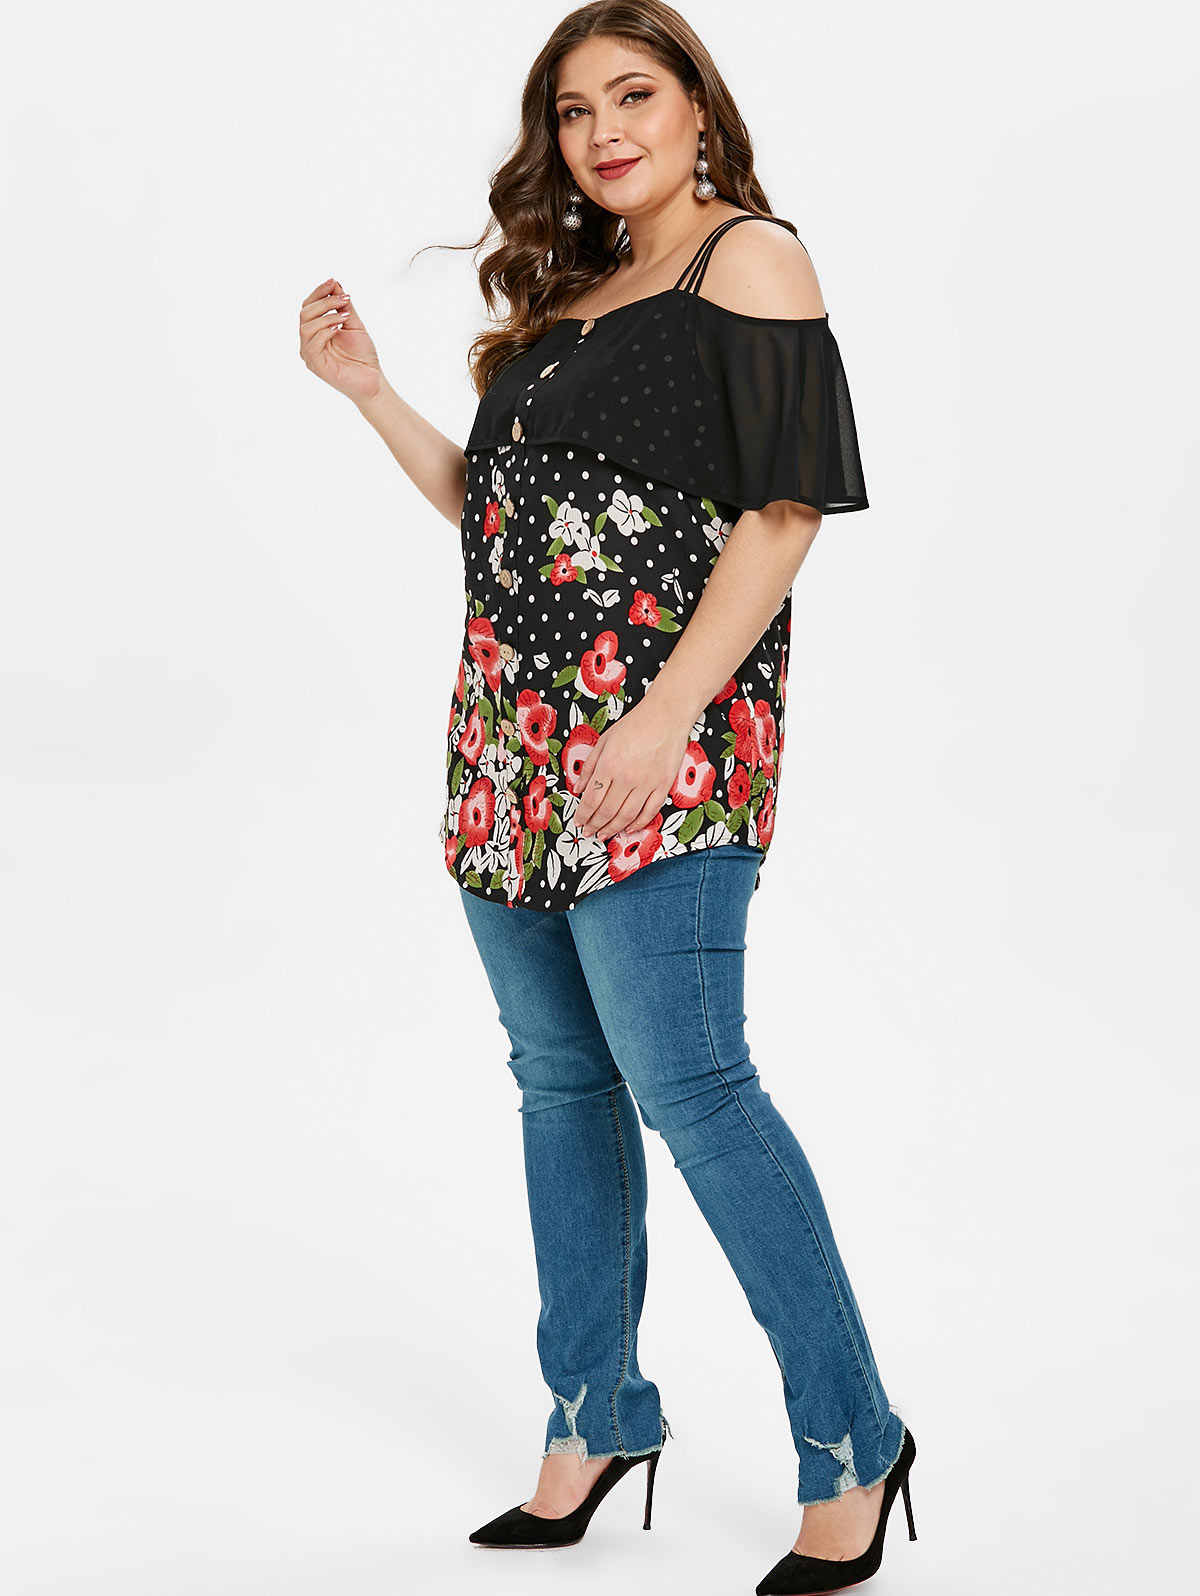 7c193d5238368 Wipalo Women Plus Size Cold Shoulder Dot Floral Print Ruffled Blouse  Spaghetti Strap Casual Chiffon Blouse Summer Ladies Top 5XL